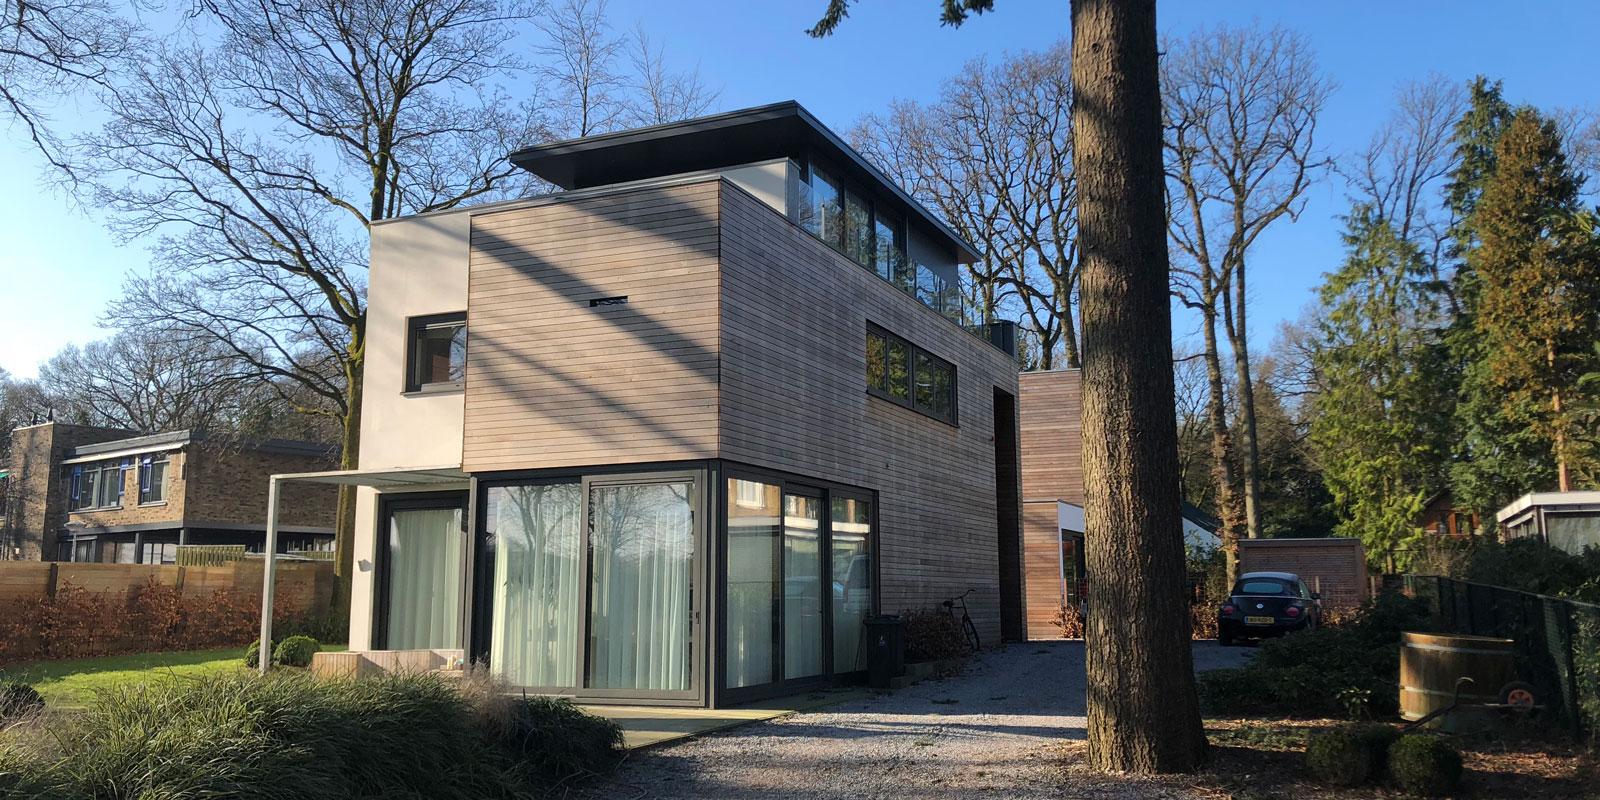 eco villa, architectenburo De Vries & Theunissen, architectenbureau, villabouw, duurzame villa, ecologische villa, the art of living